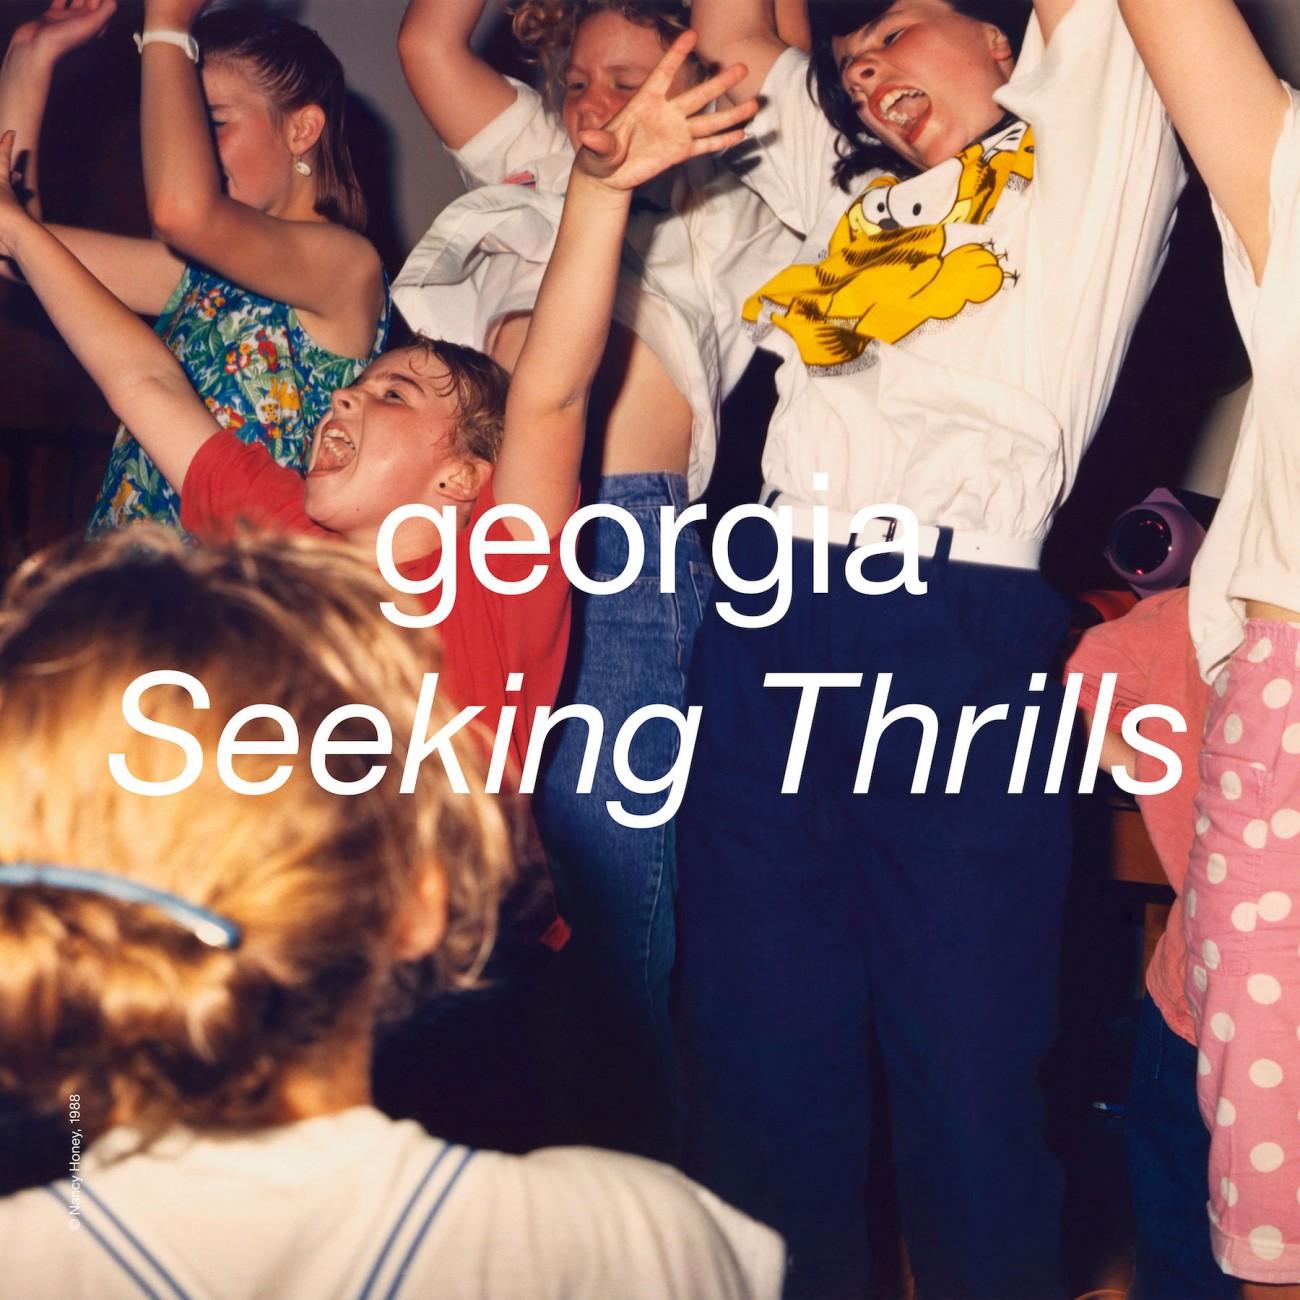 georgia-Seeking-Thrills